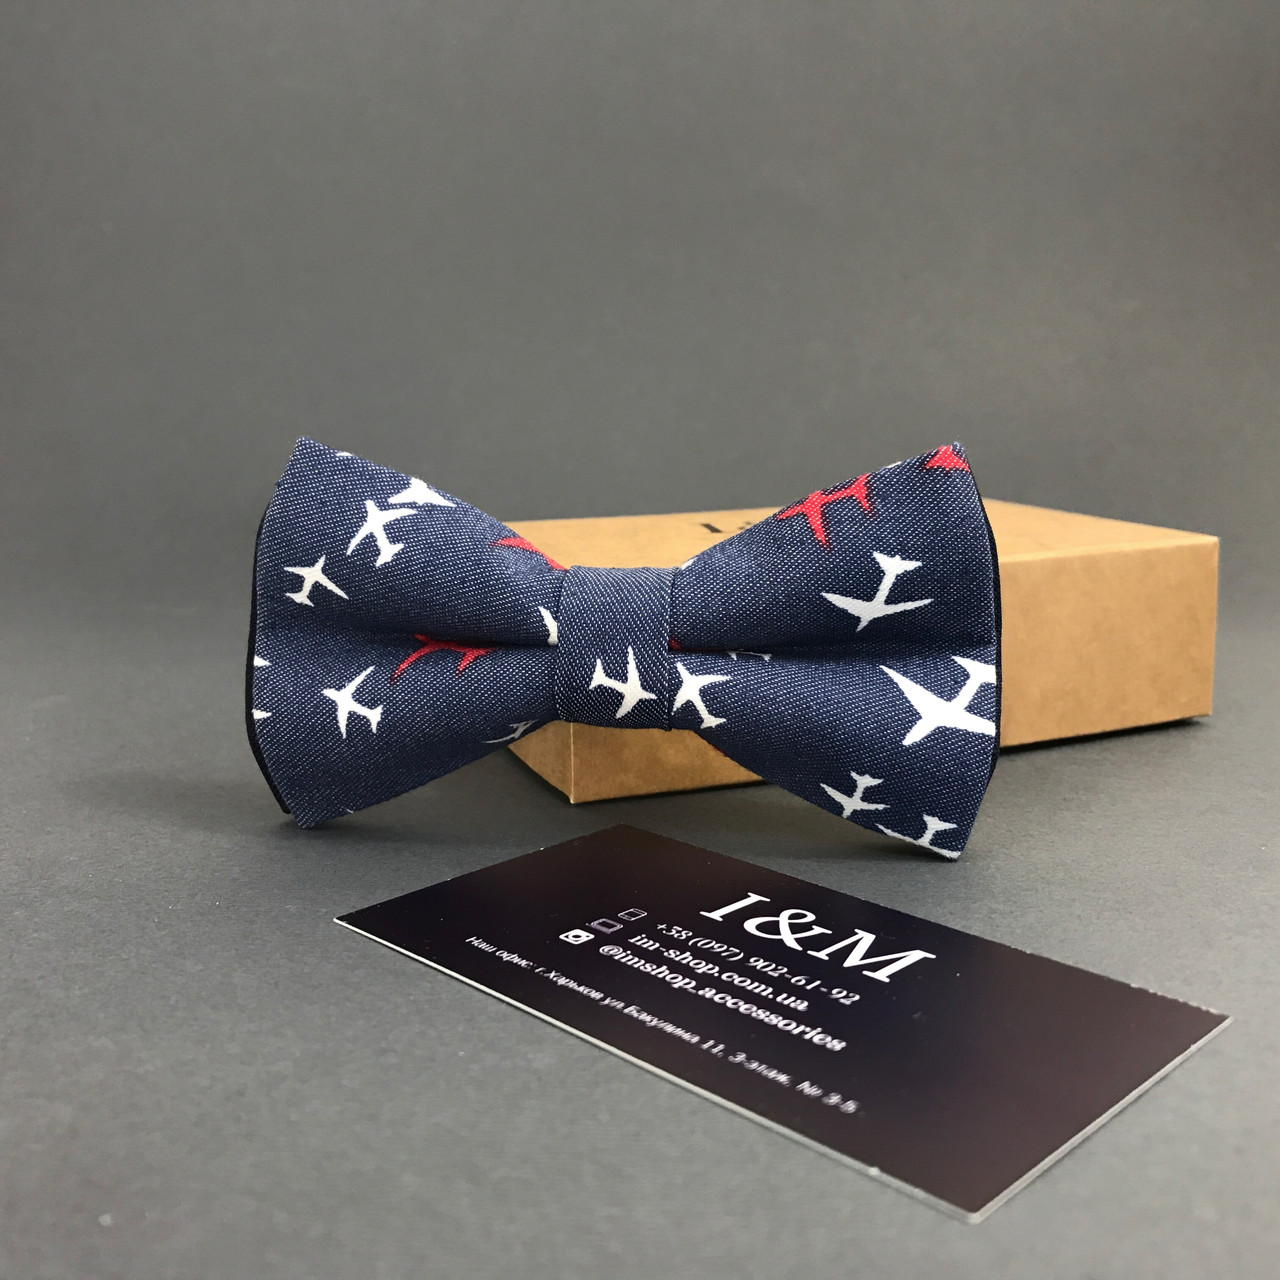 Краватка-метелик I&M Craft сірий з літачками (010261)